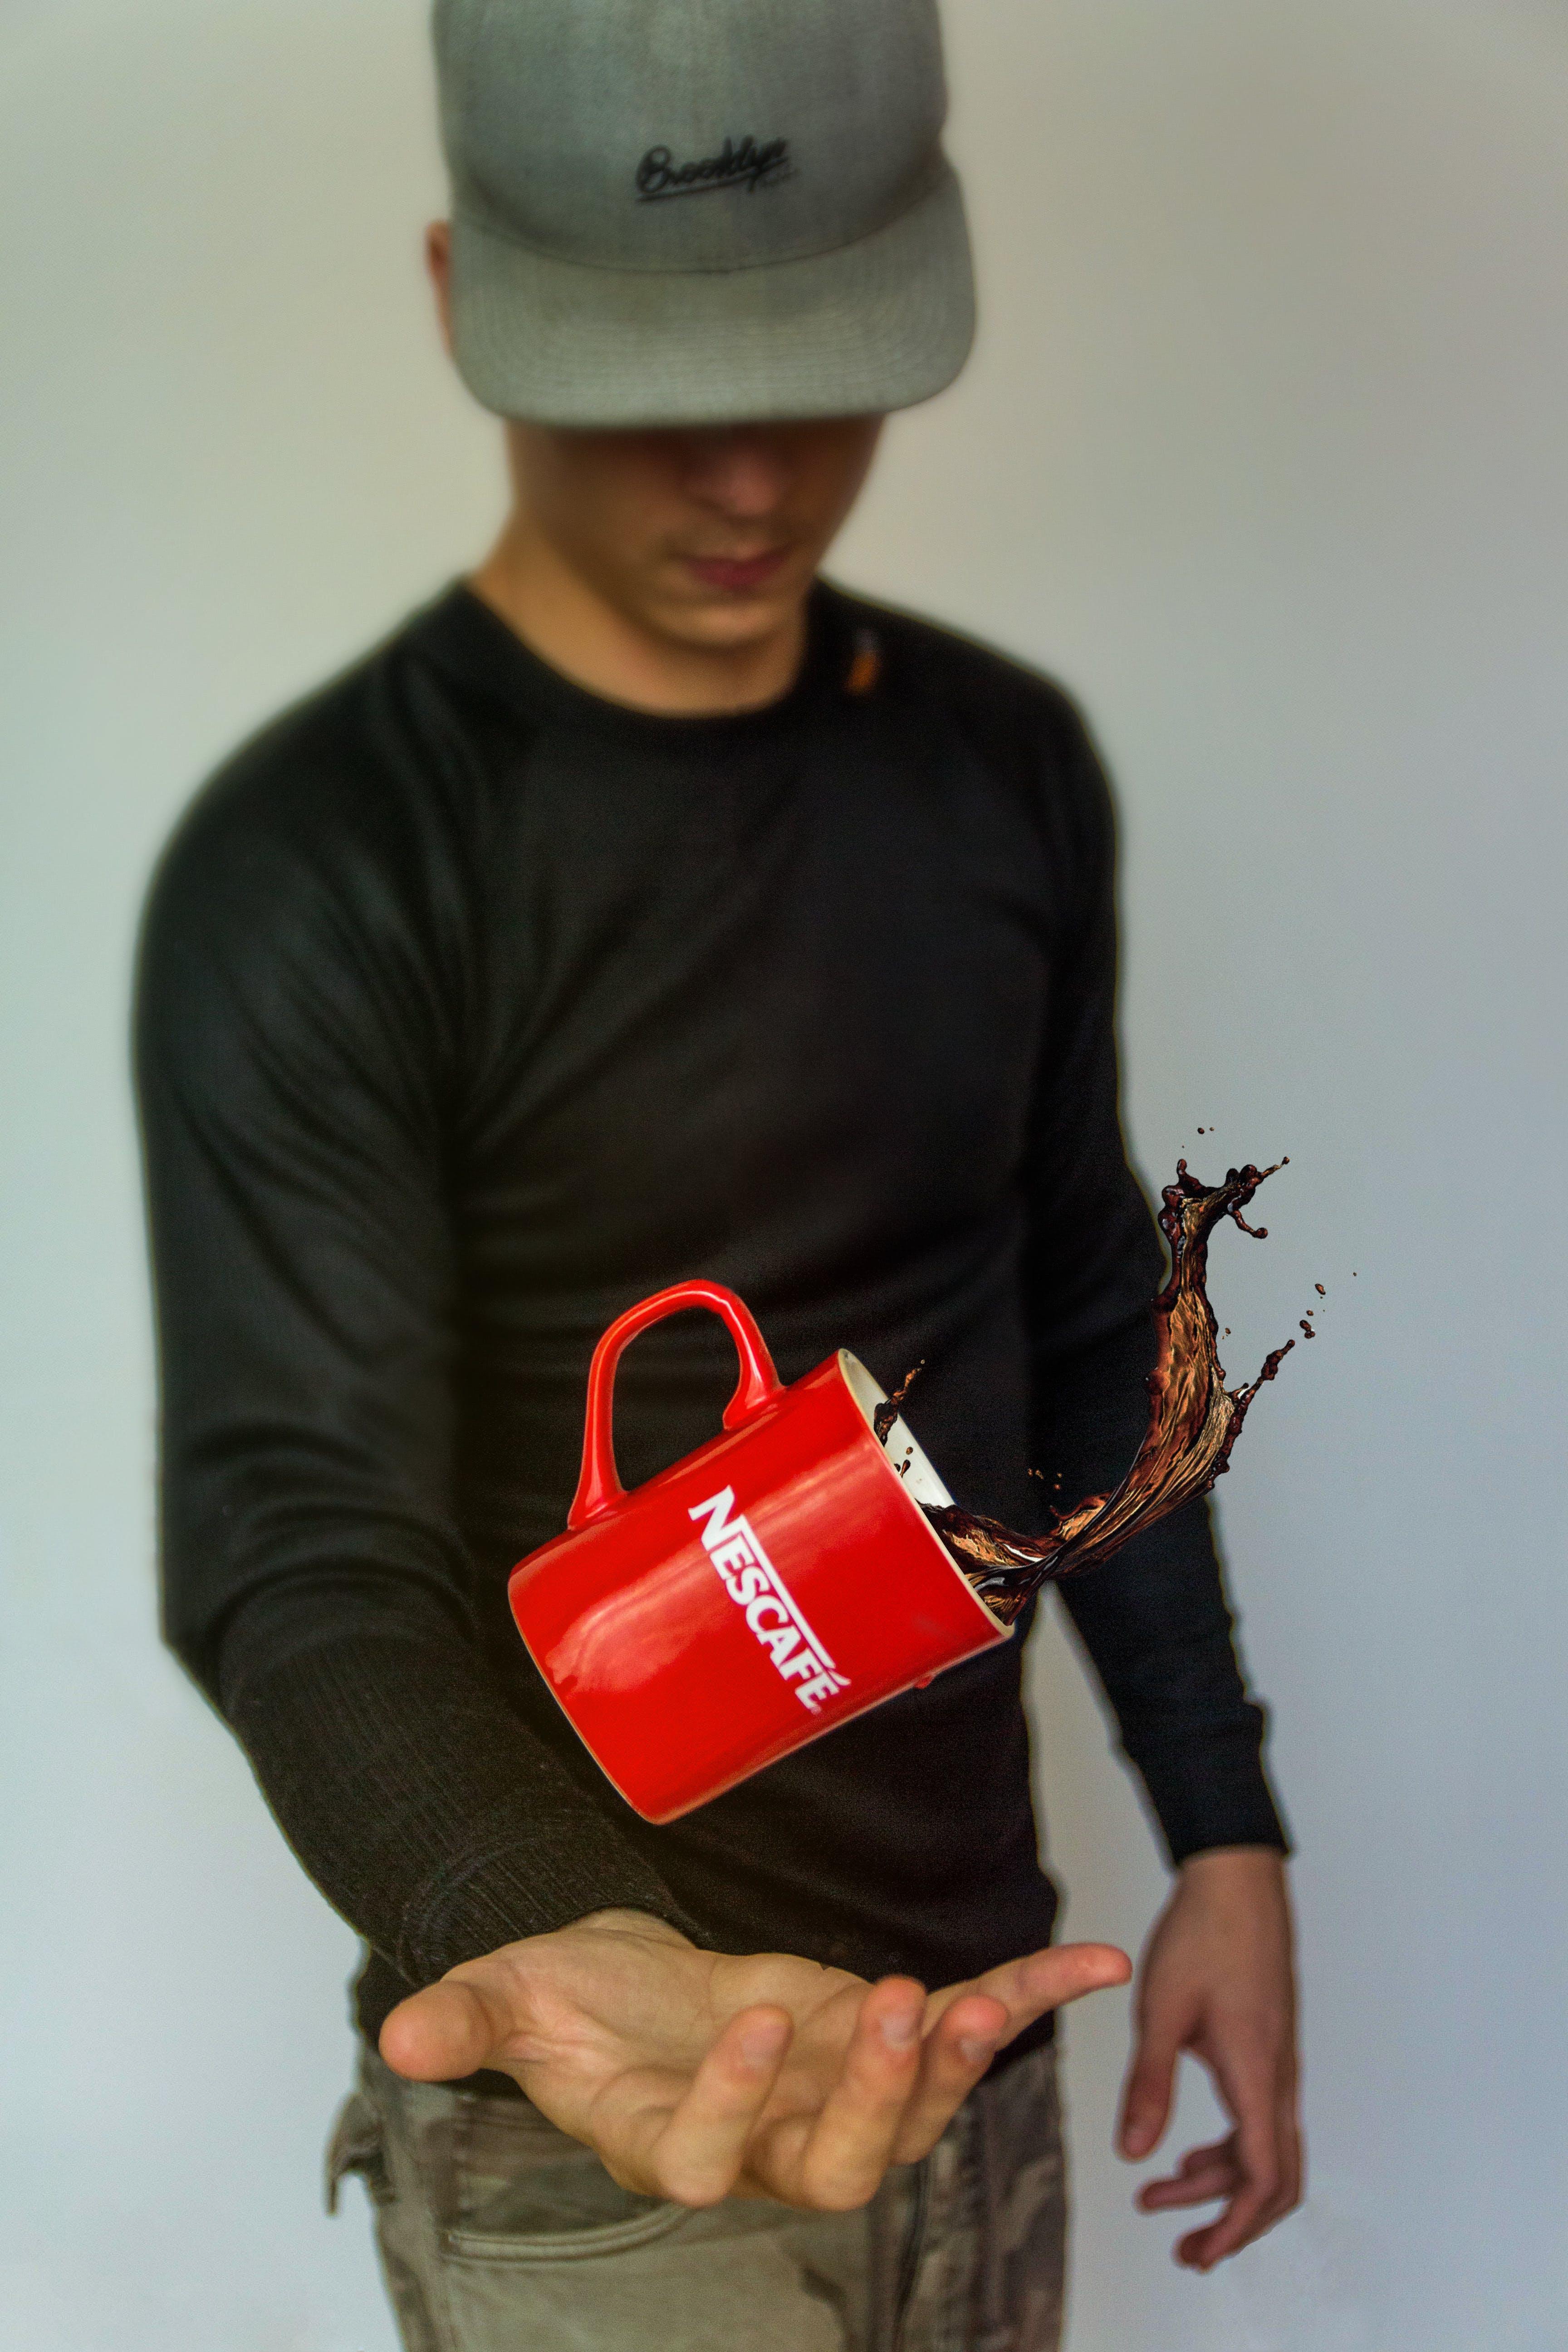 Photo Of Man Tossing Nescafe Mug